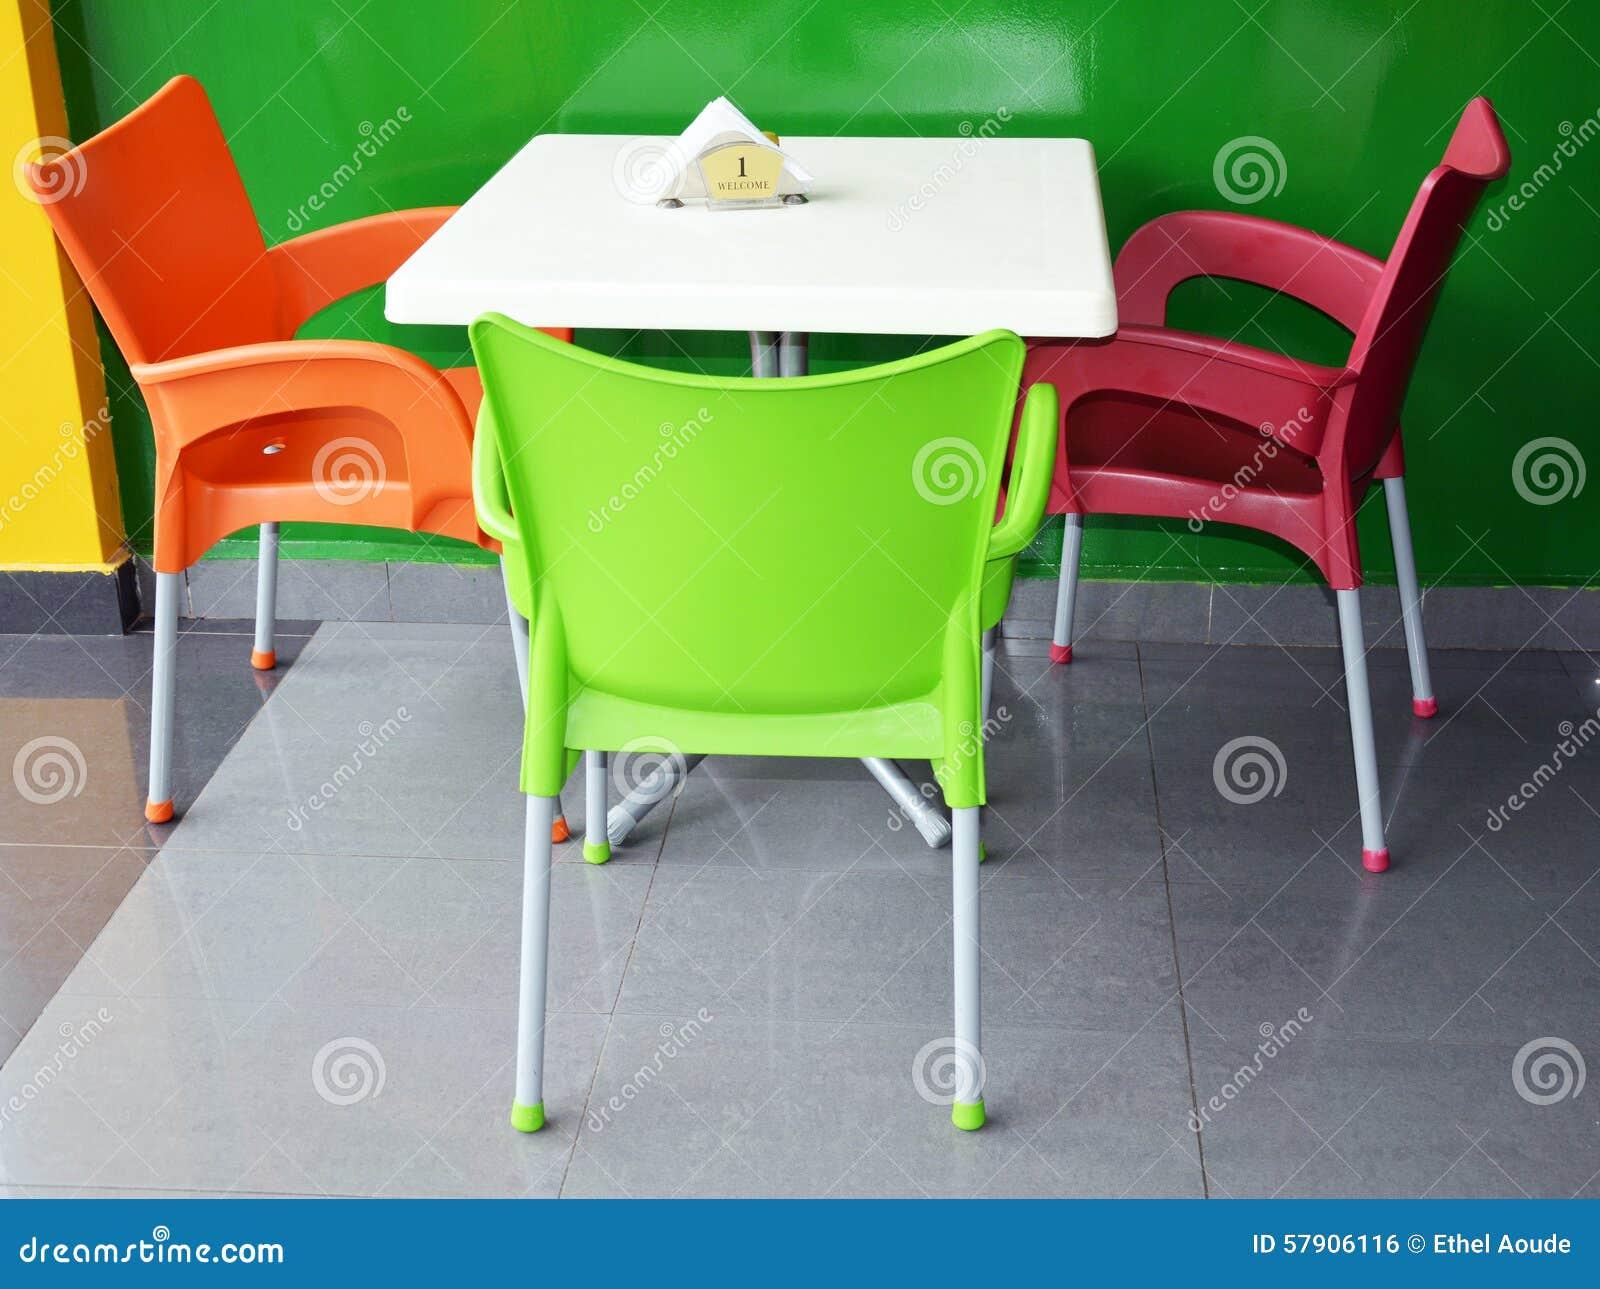 Enjoyable Table At Juice Bar Stock Photo Image Of Desk Chilled Download Free Architecture Designs Intelgarnamadebymaigaardcom